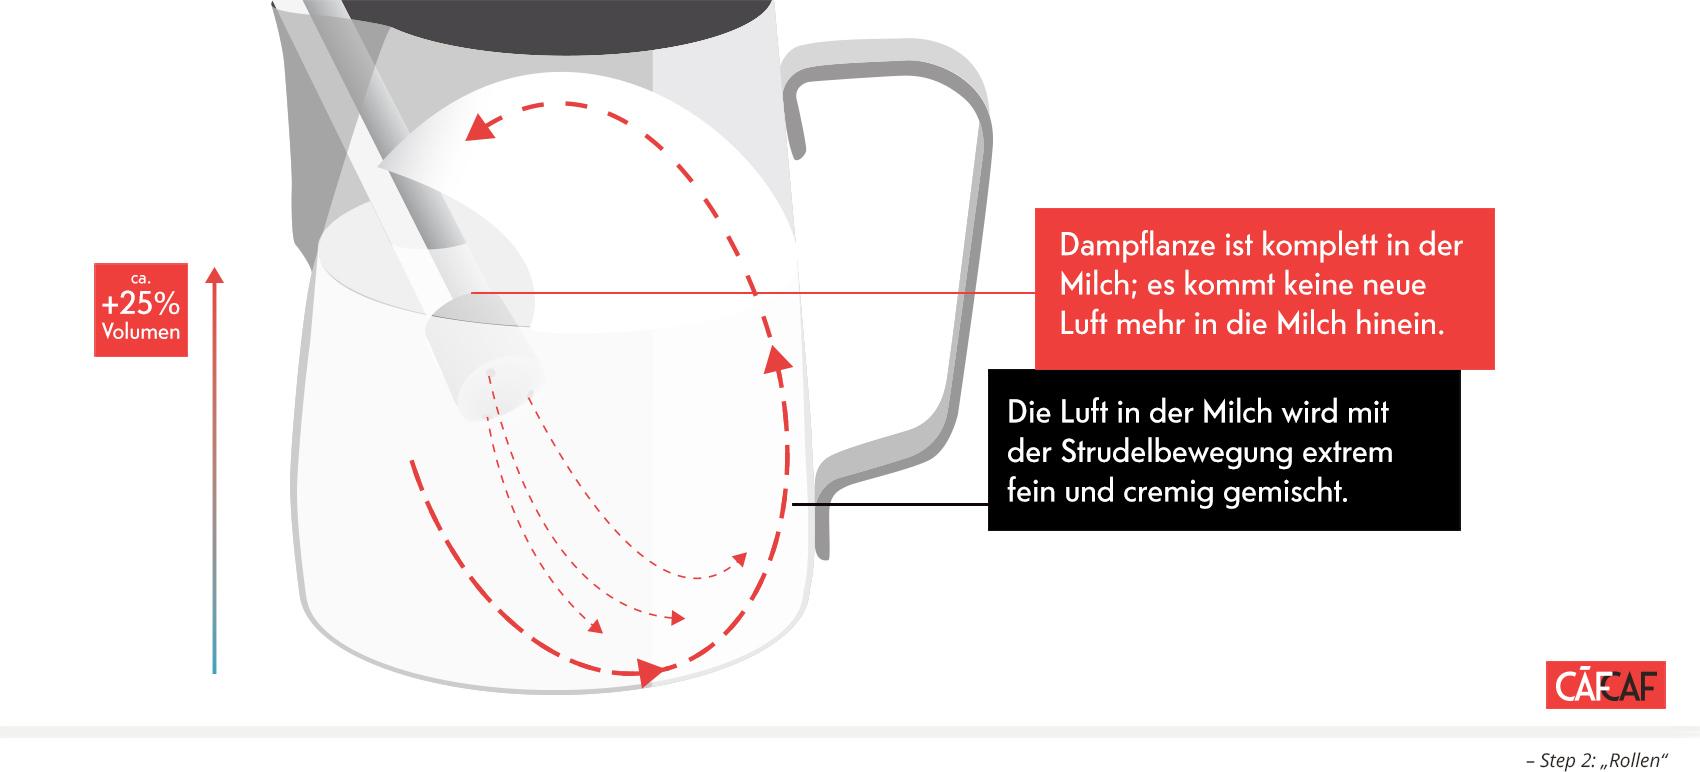 "CafCaf Kaffee Blog, Kaffeeblog: – Step 2: ""Rollen"""